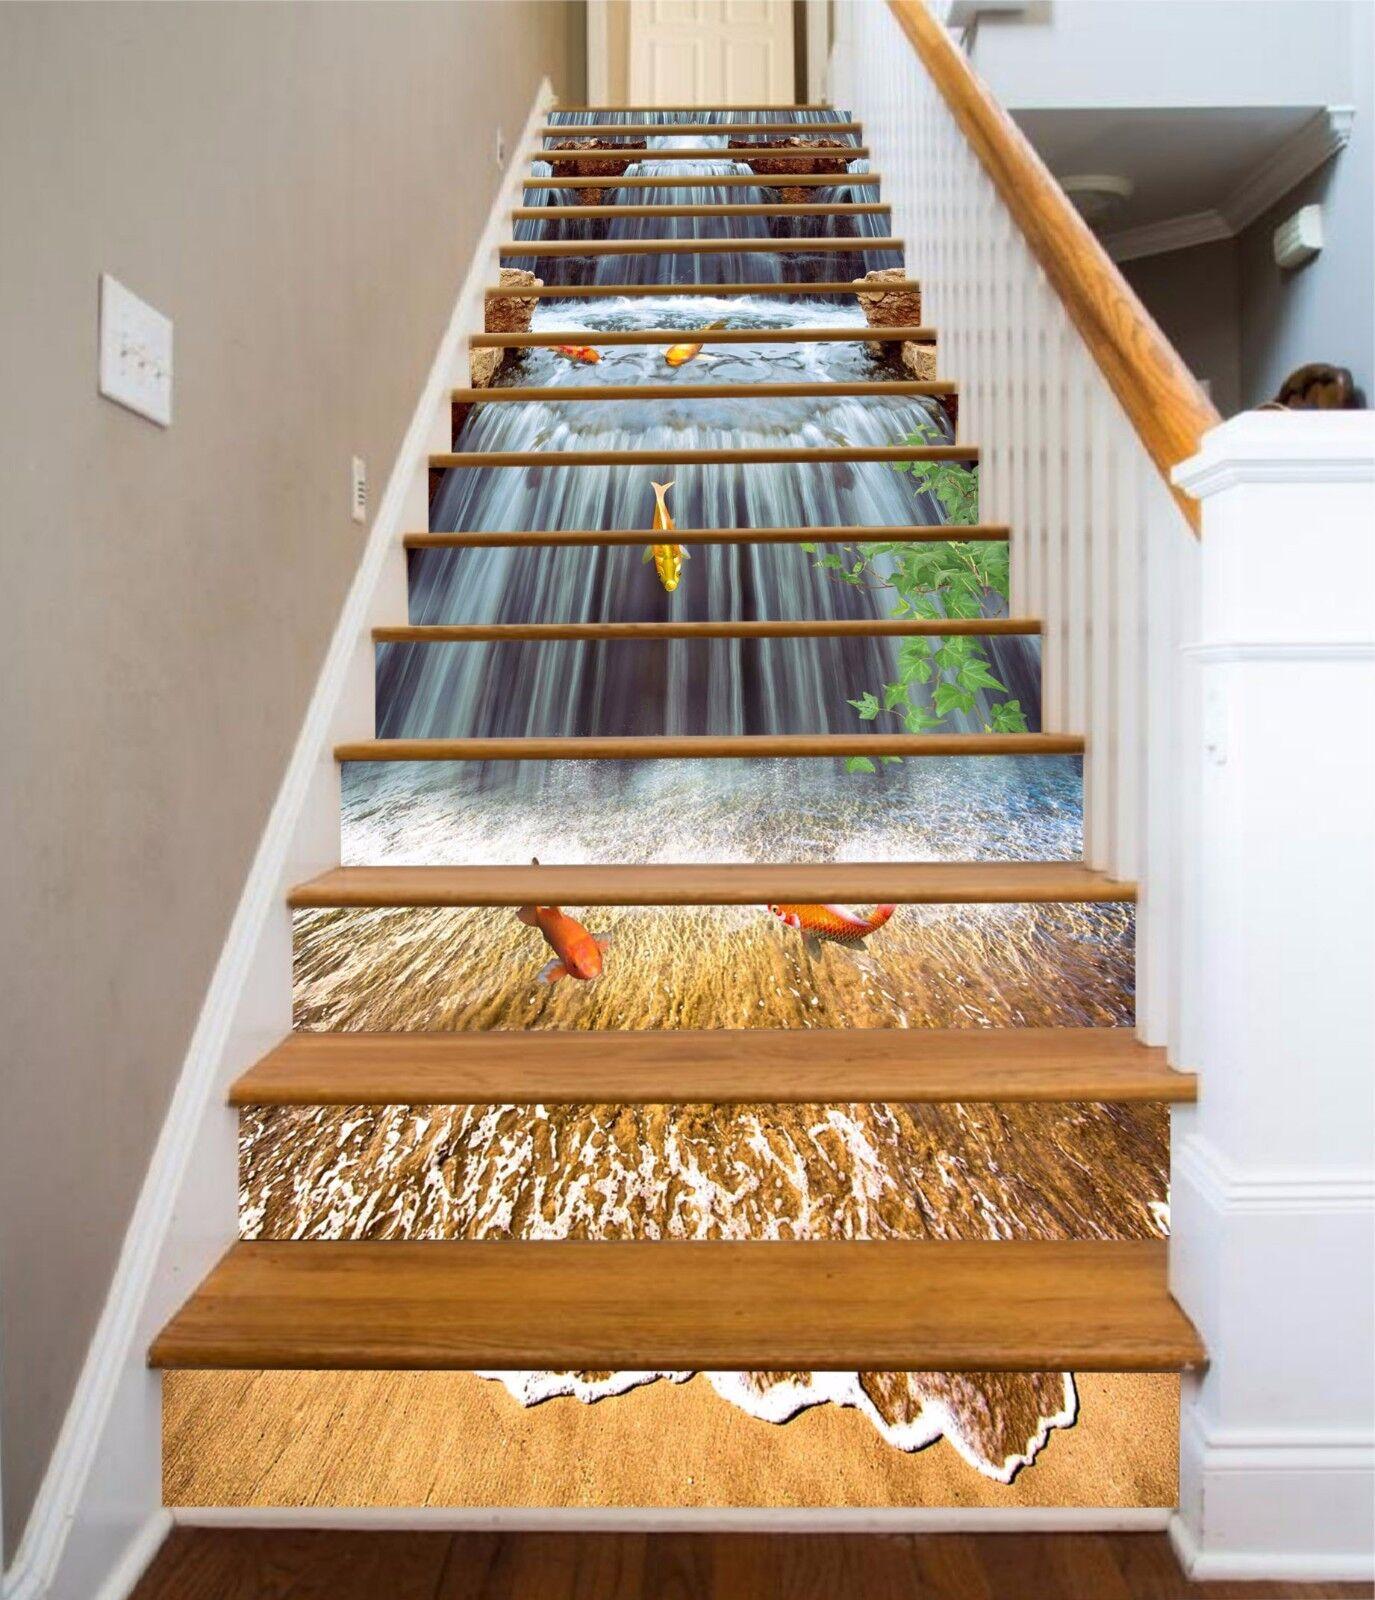 3D Carp Waterfall 79Stair Risers Decoration Photo Mural Vinyl Decal Wallpaper AU